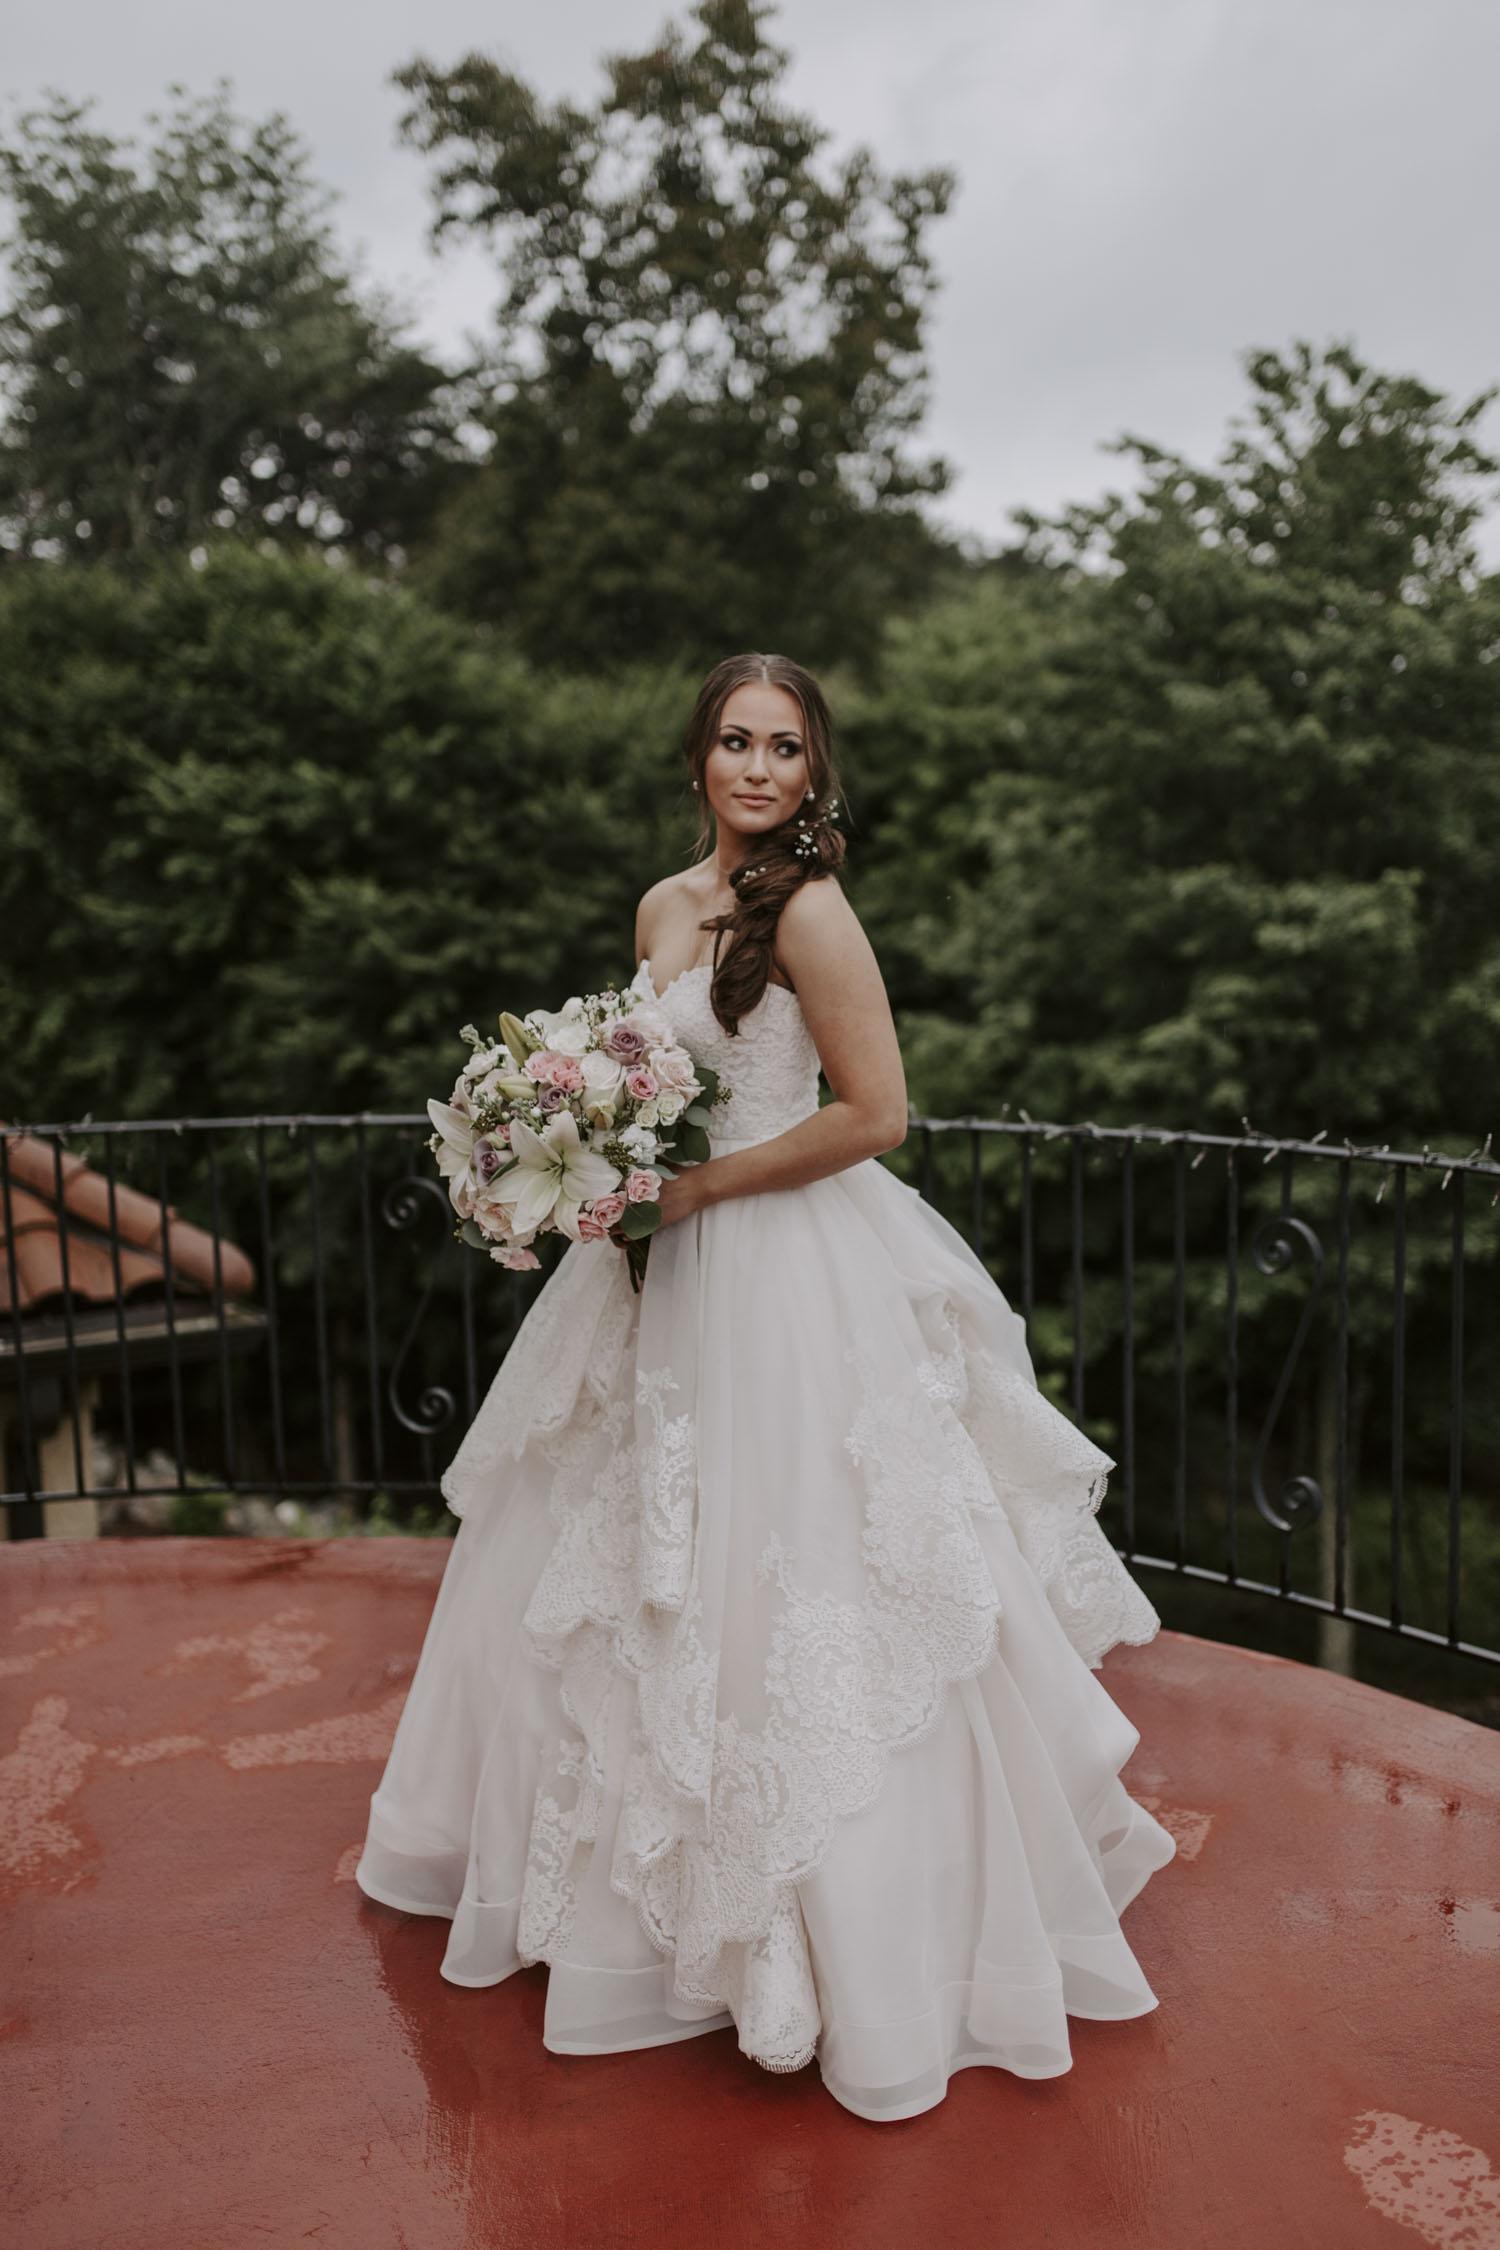 Rainy Bella Collina Wedding - Bridal Portrait | Kayli LaFon Photography, Greensboro Winston-Salem NC Wedding Photographer